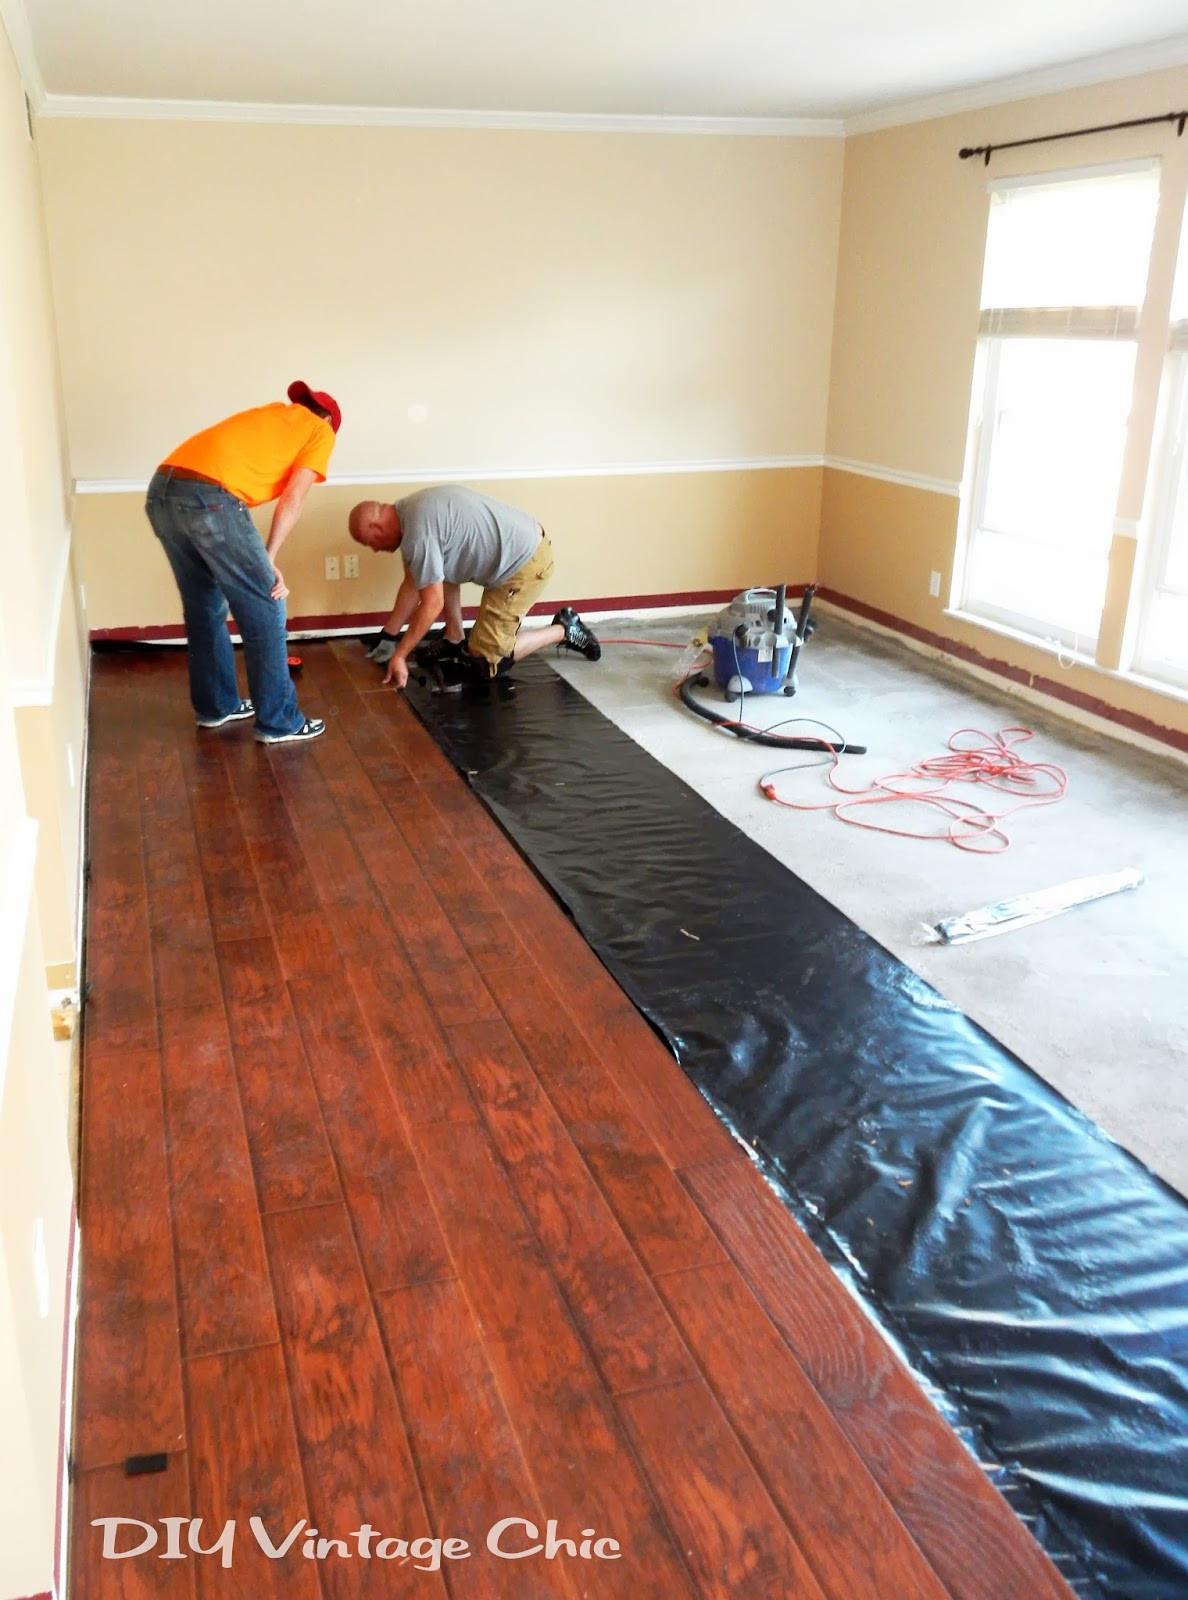 Best ideas about DIY Wood Floor . Save or Pin DIY Vintage Chic DIY Laminate Flooring Now.